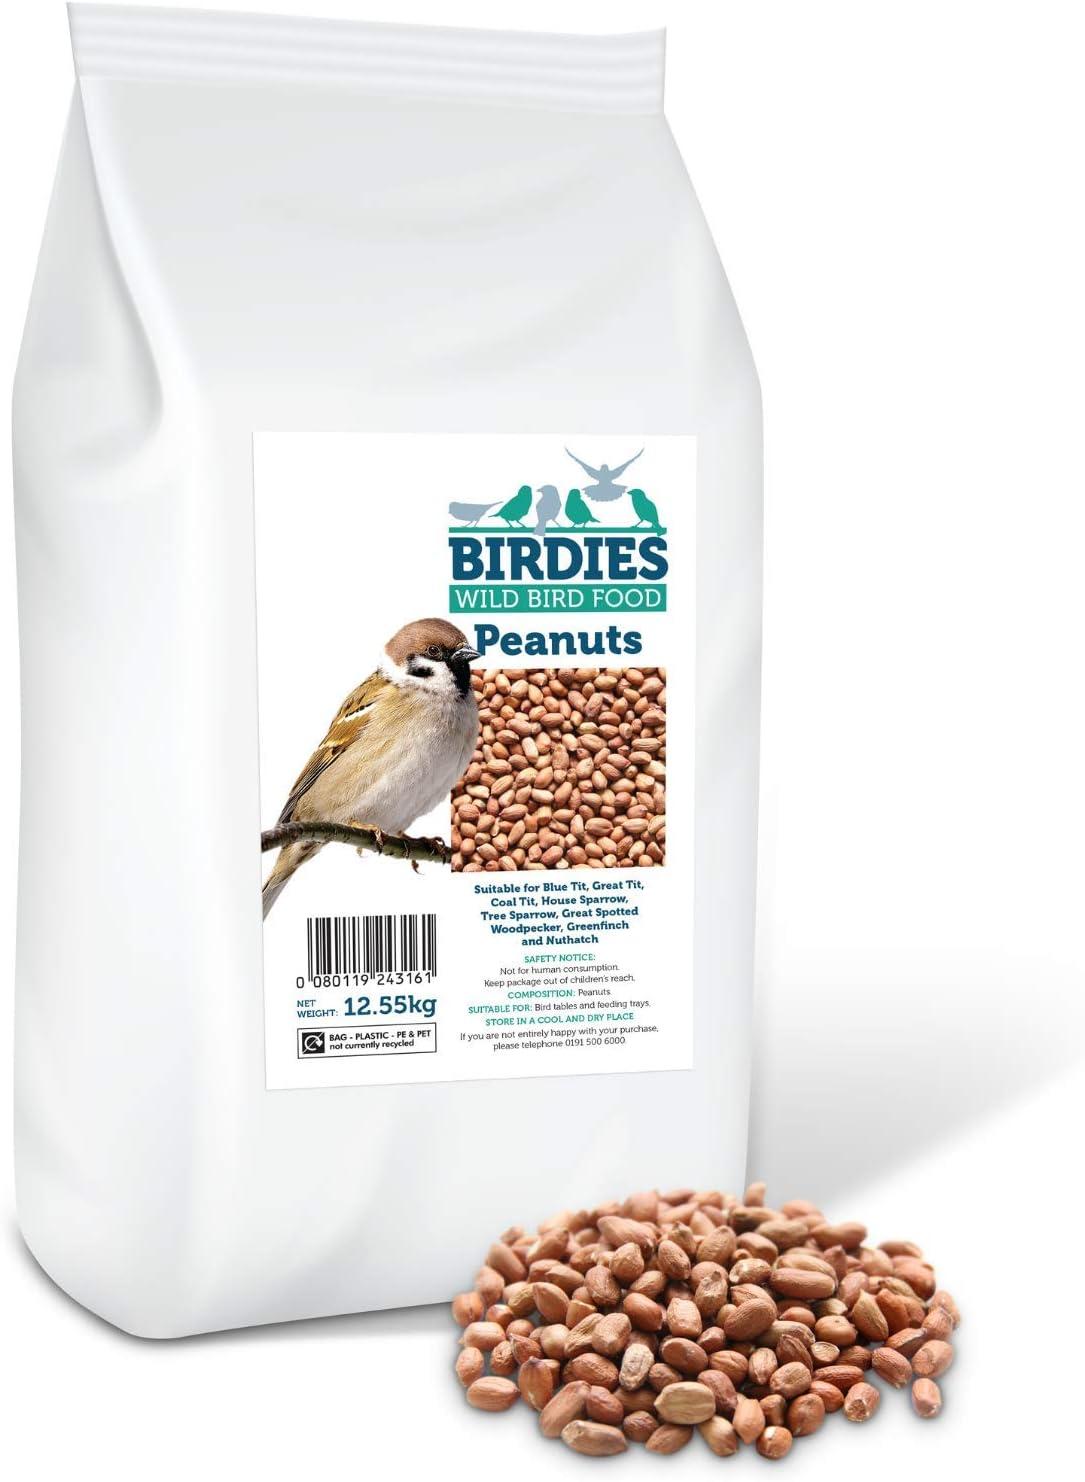 Birdies Wild Bird Food- Cacahuetes Premium para pájaros Silvestres - 12,55 kg